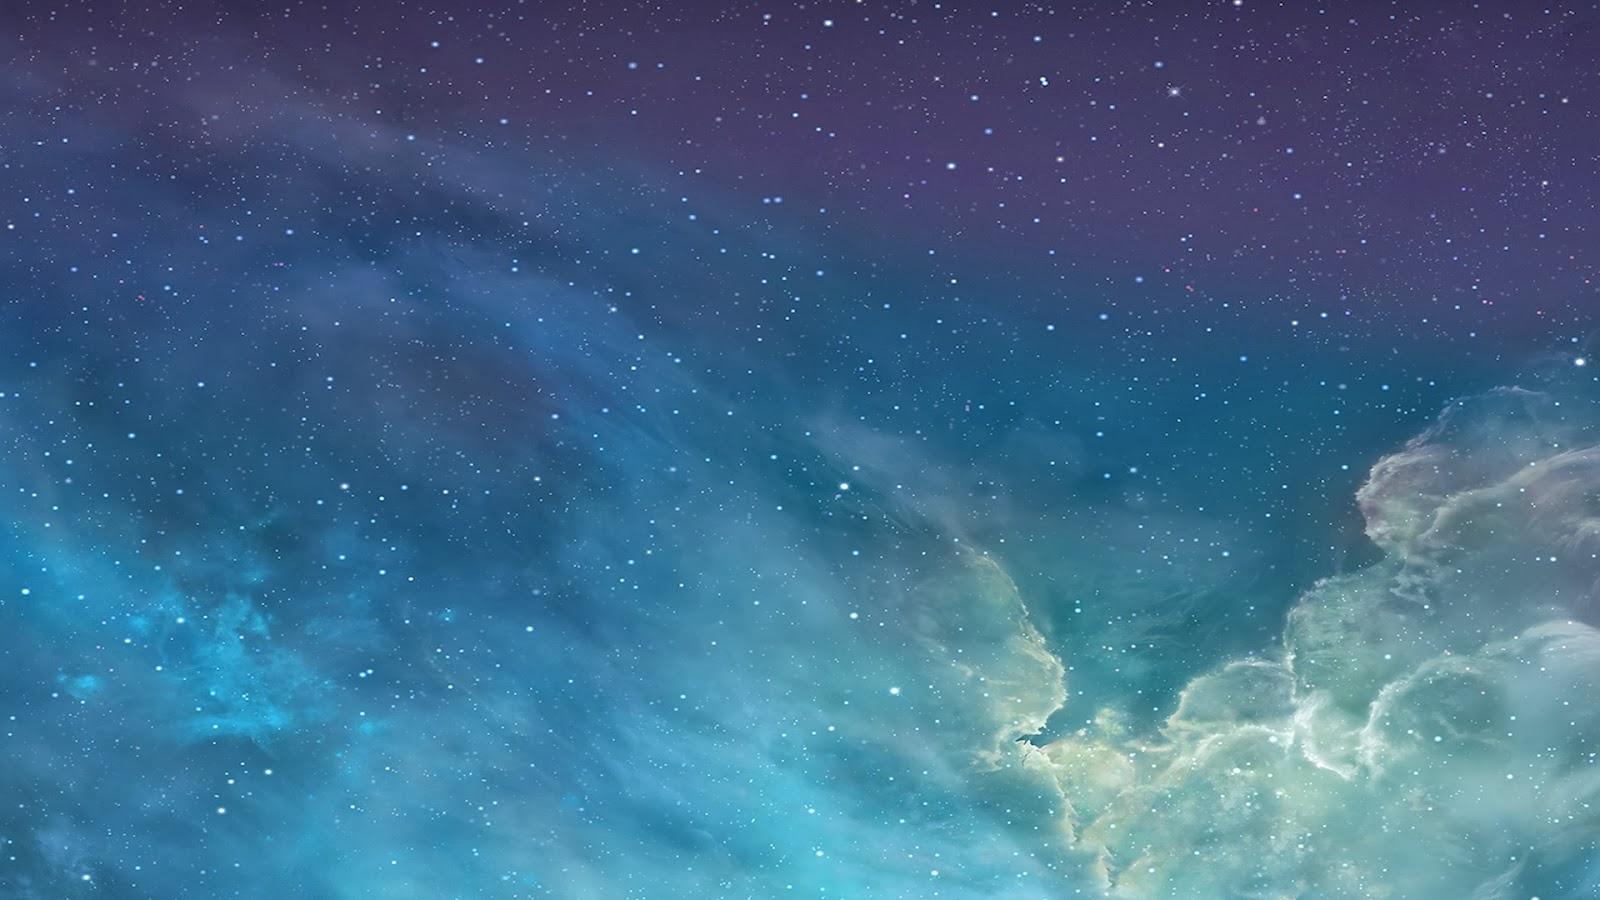 Samsung Galaxy S5 Wallpaper: Galaxy HD Wallpapers For Desktop